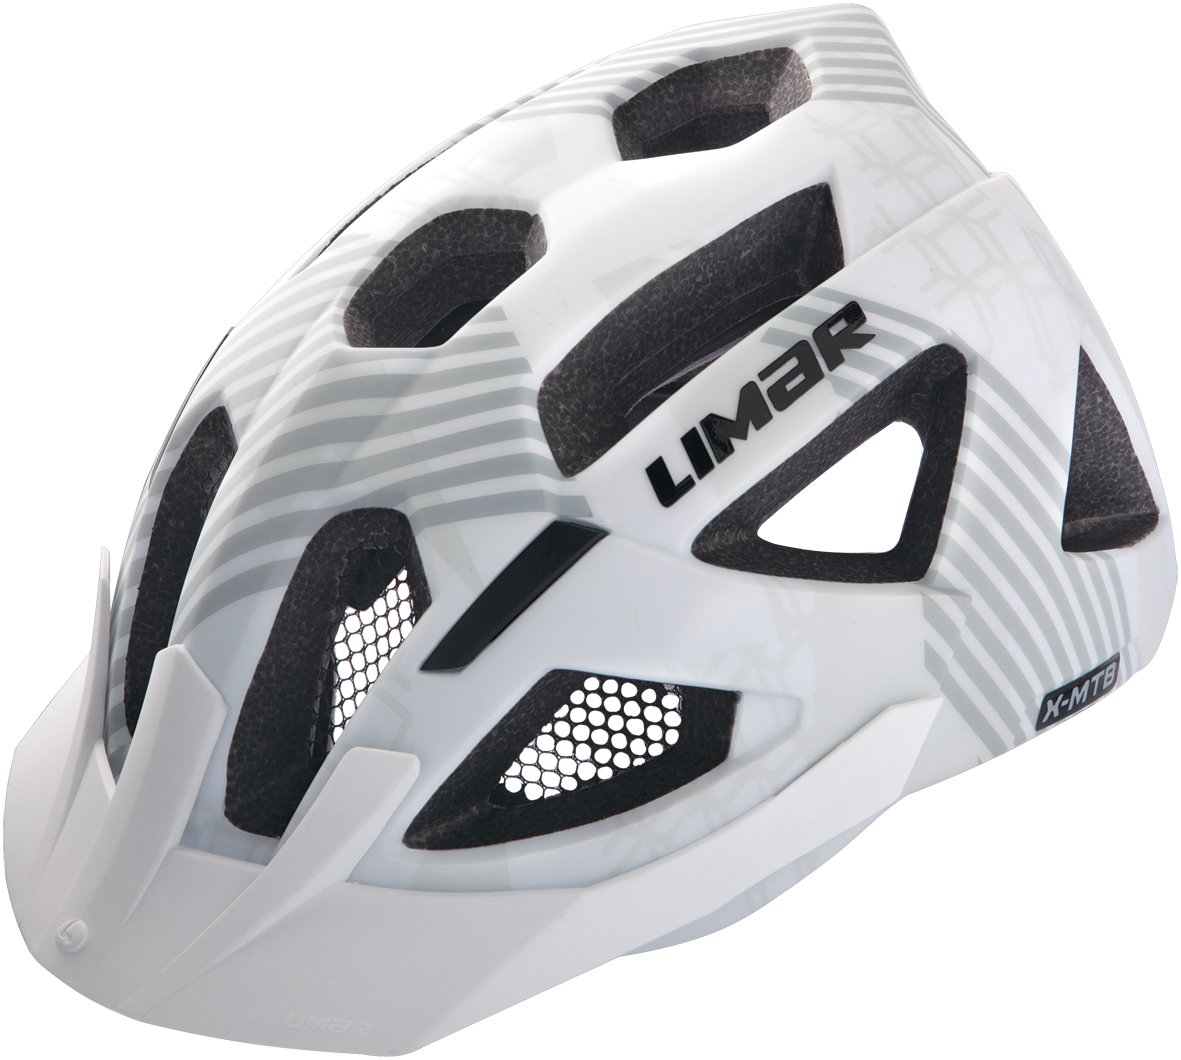 Limar Casque de vélo X-MTB Blanc blanc mat m   B00AFEO430